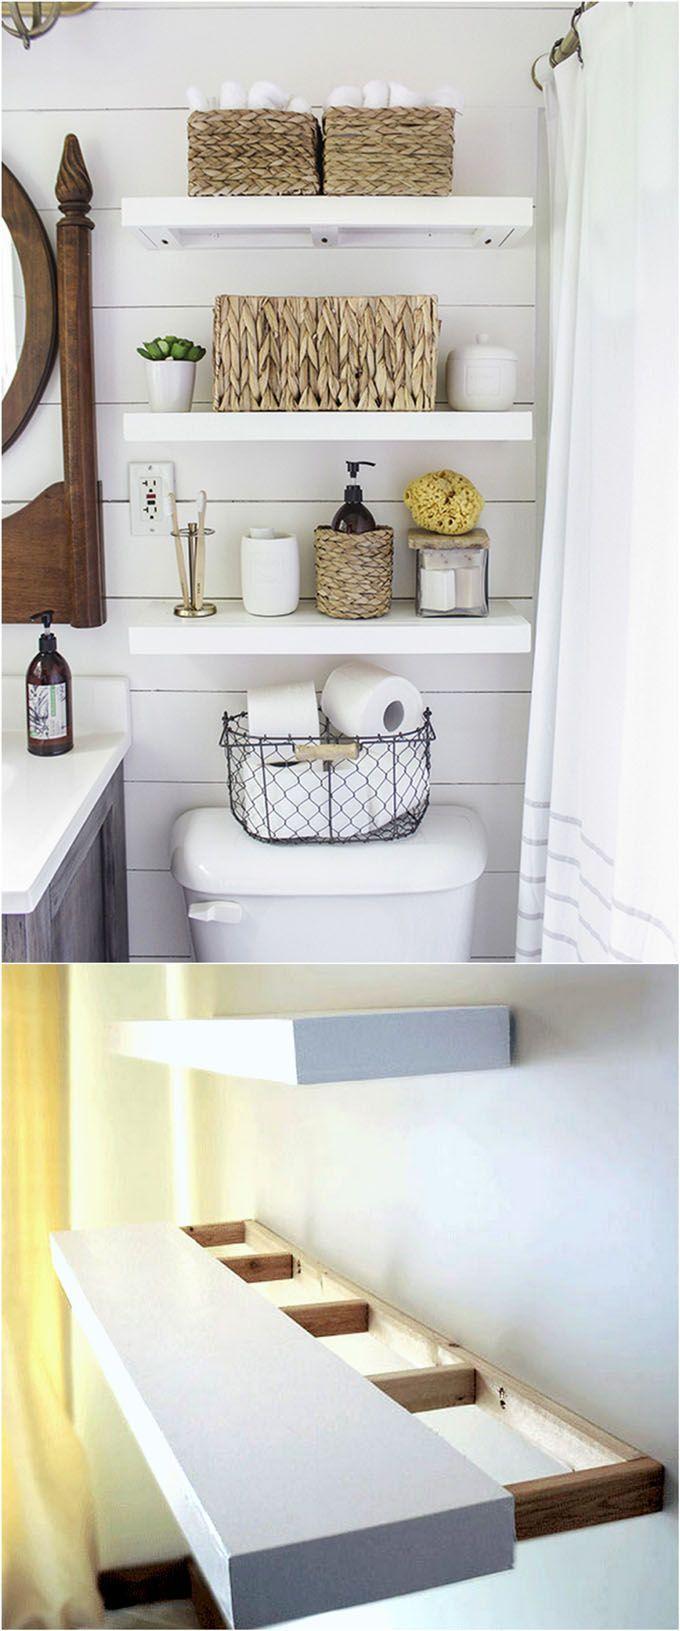 16 Easy And Stylish Diy Floating Shelves Wall Shelves Floating Shelves Diy Shelves Kitchen Wall Shelves Small bathroom wall shelf